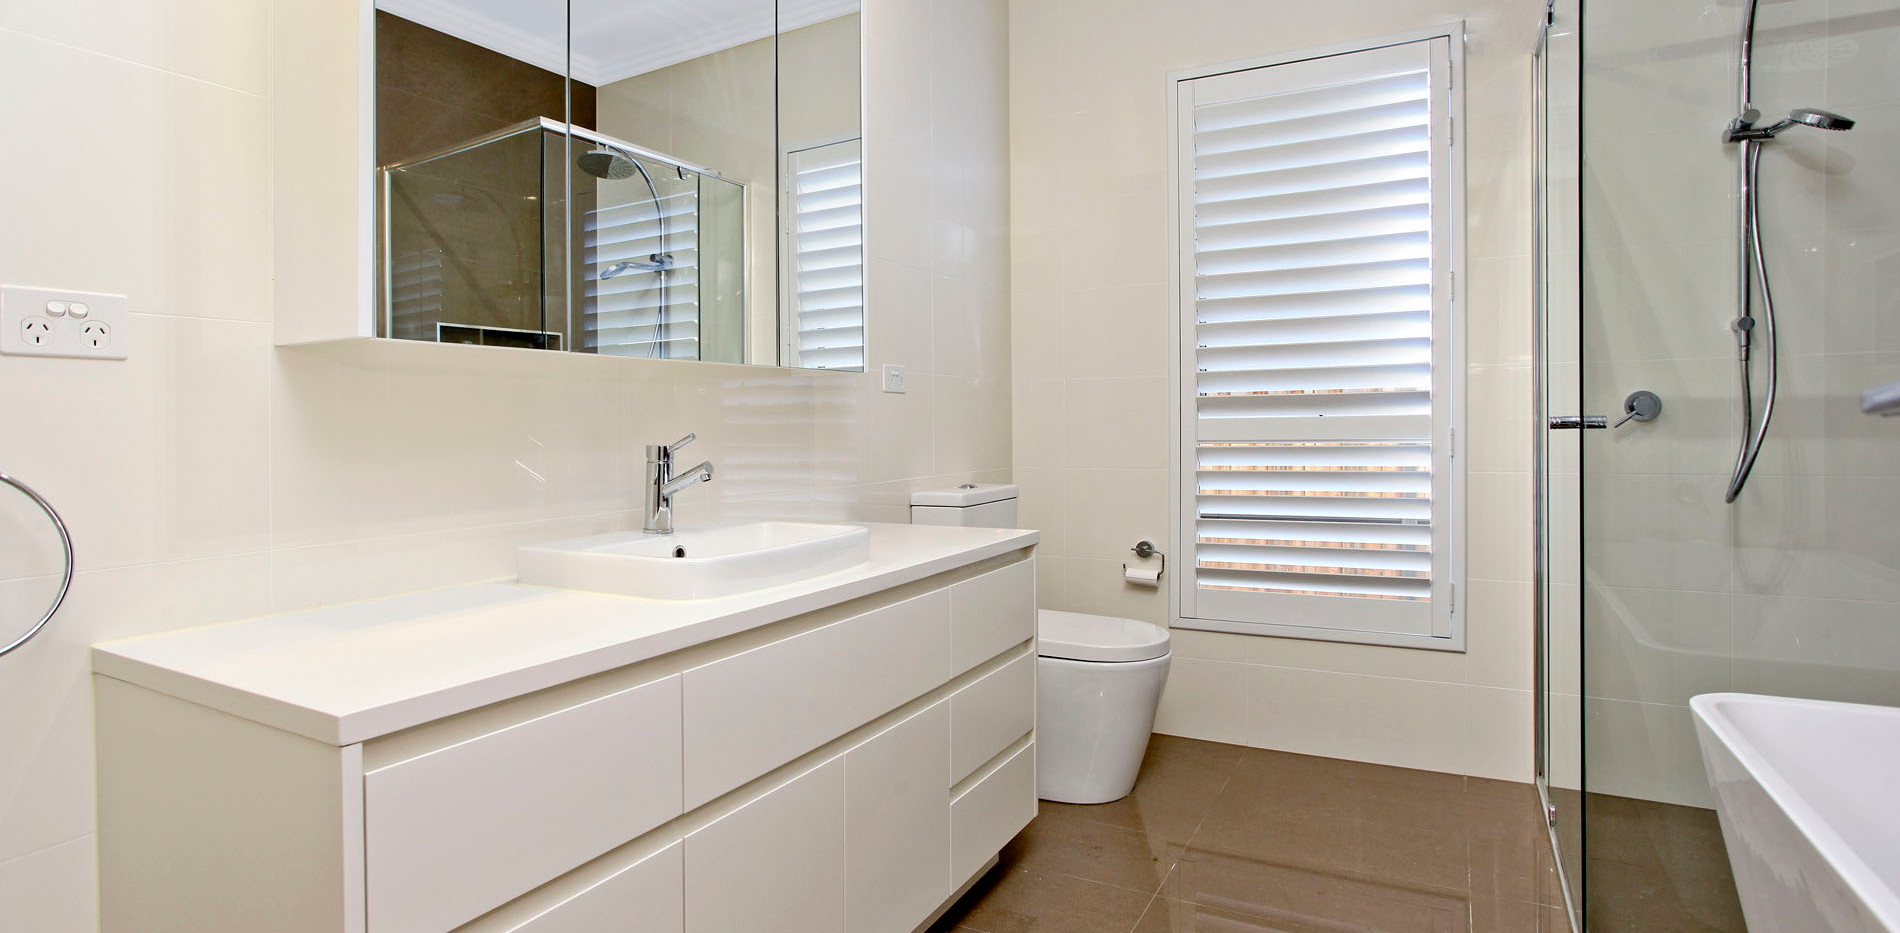 Hawkesbury bathrooms and Kitchens (38)